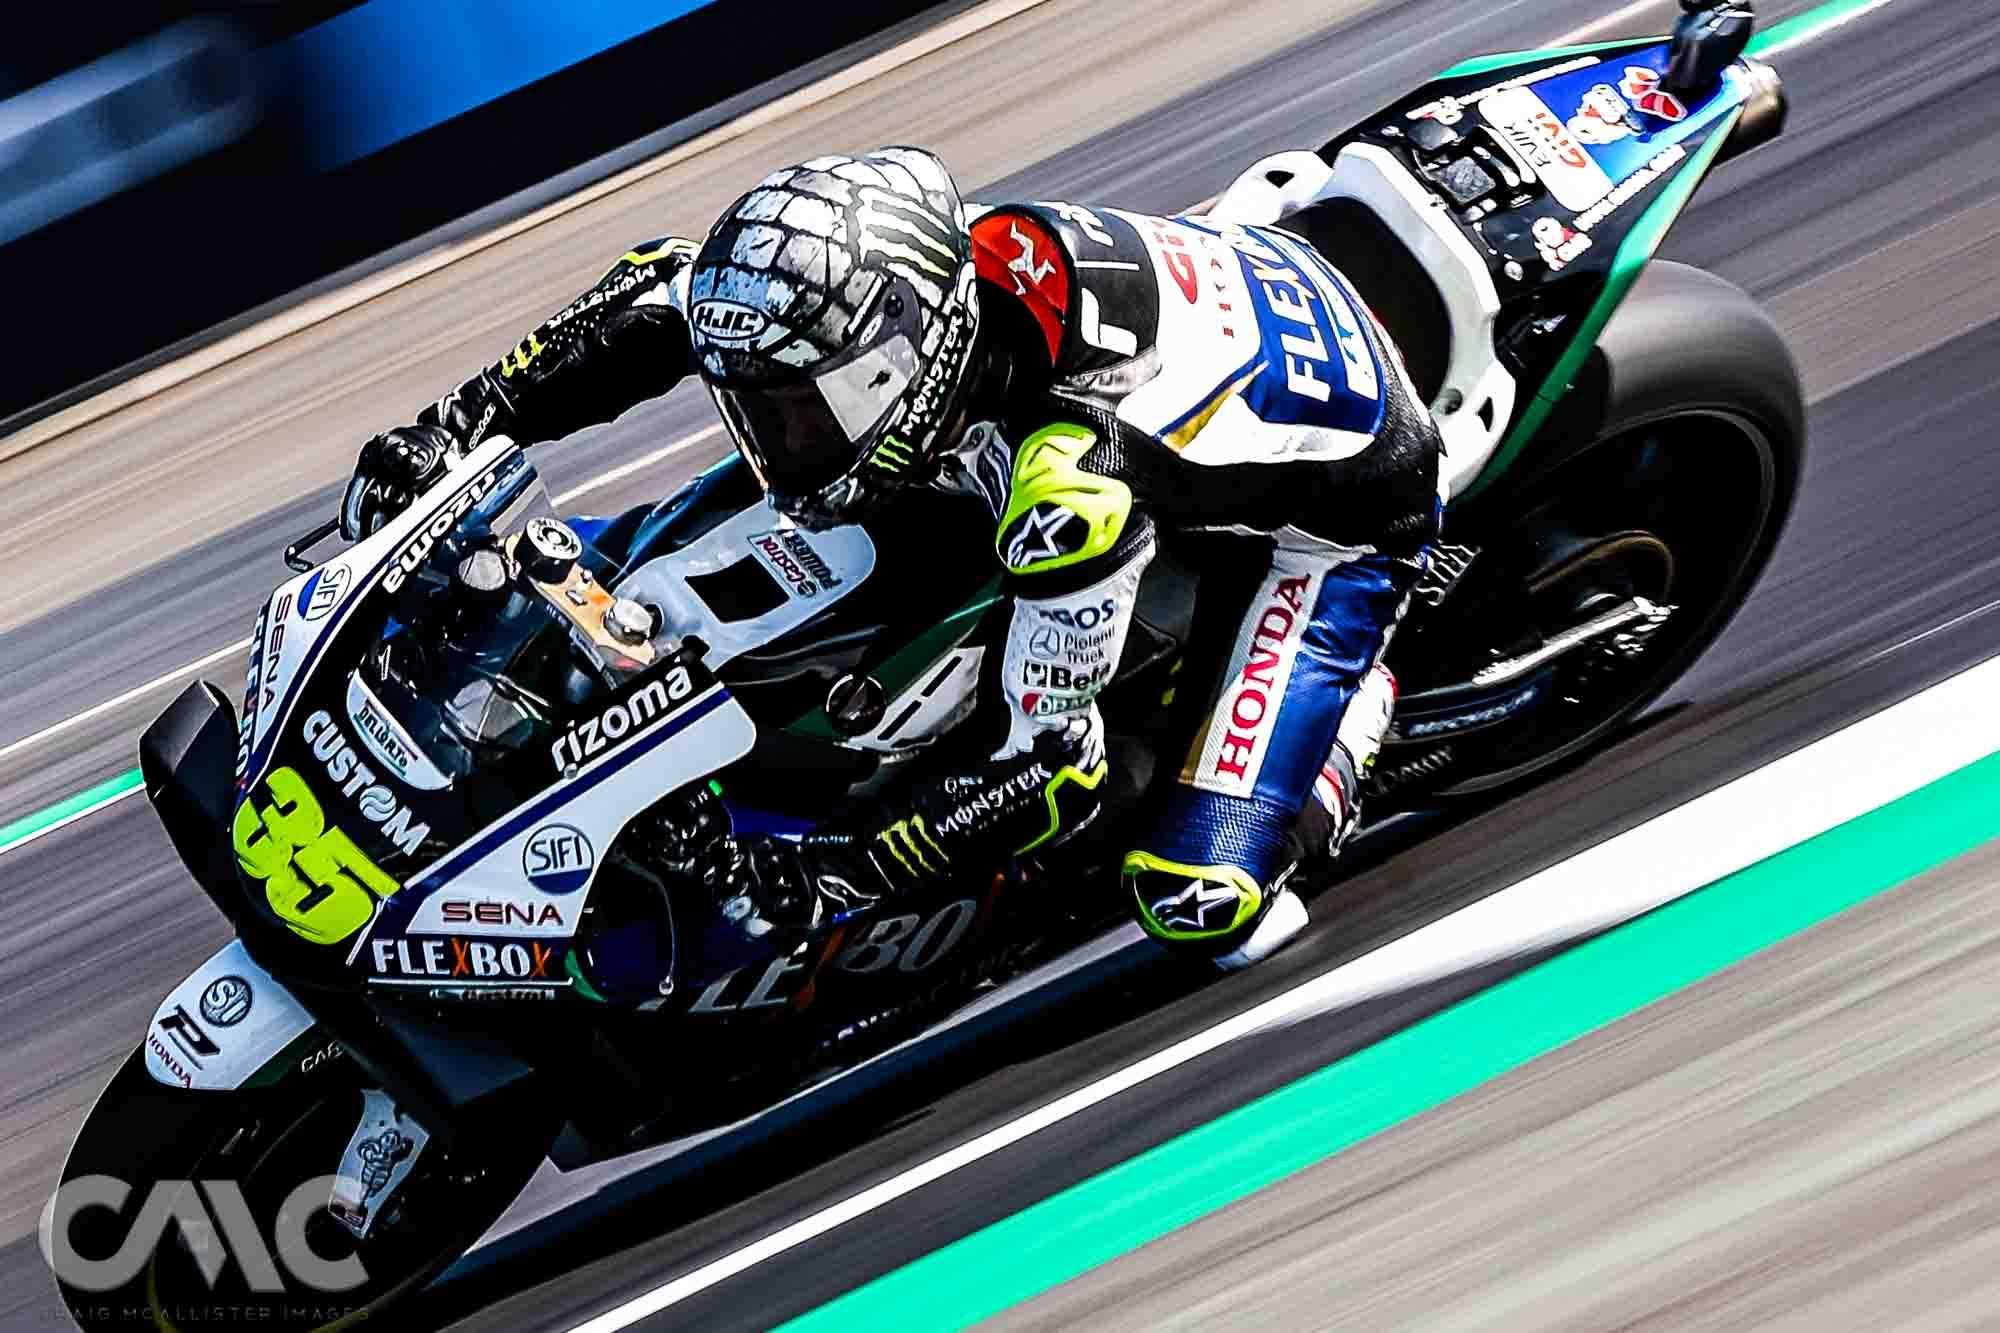 CMC_MotoGP_FP3_Silverstone 50-1404001.jpg